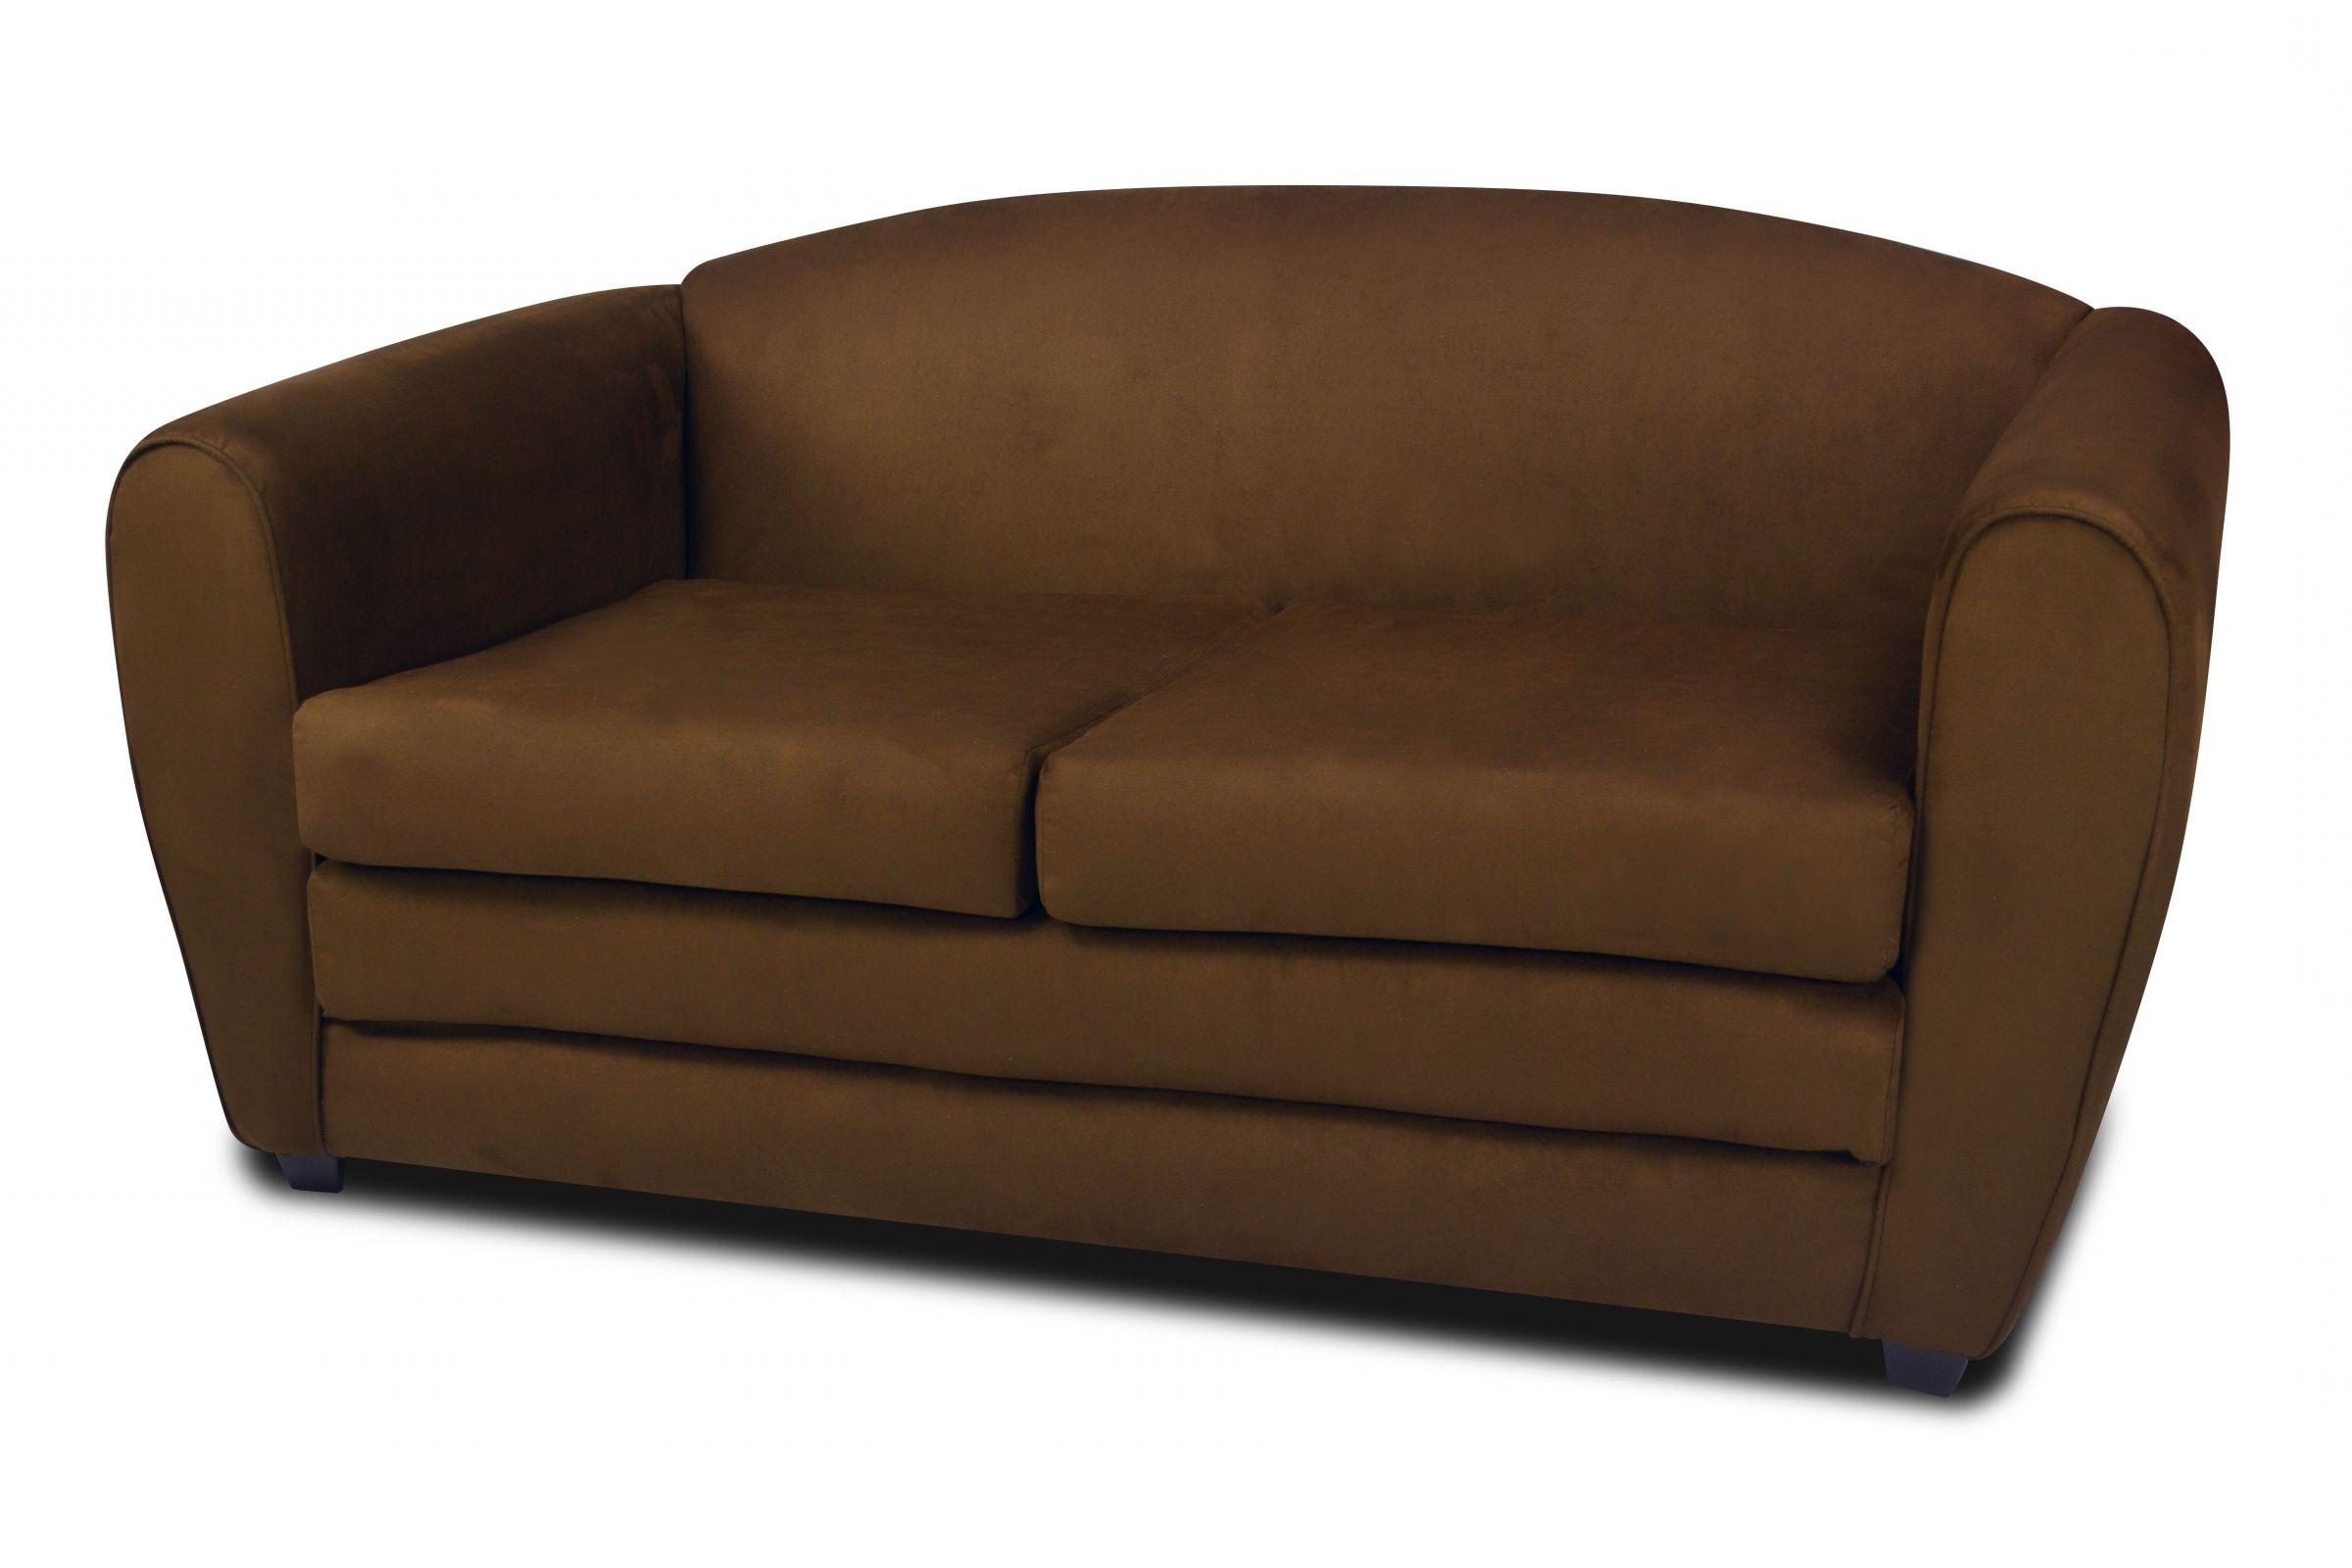 Furniture : Tufted Sectional Sofa Sofa Kijiji Ottawa Gatineau Pertaining To Fashionable Gatineau Sectional Sofas (View 19 of 20)